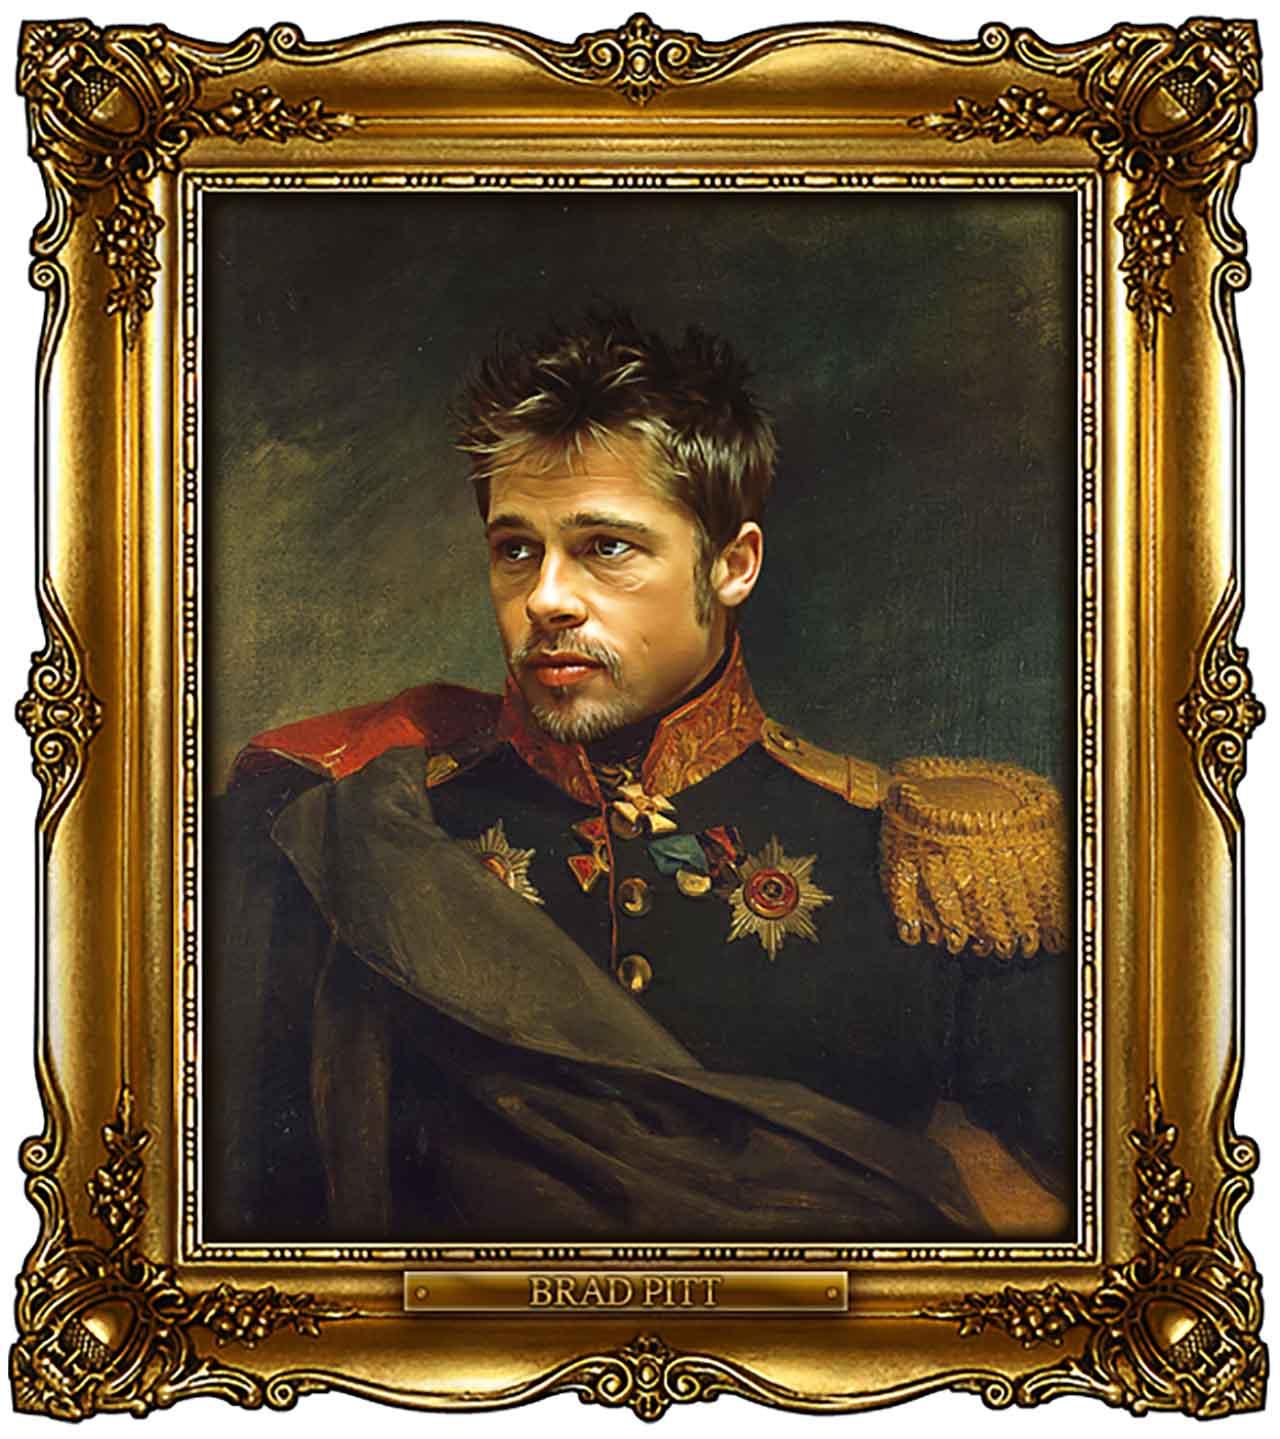 Artist Turns Famous Actors Into Russian Generals - Brad Pitt